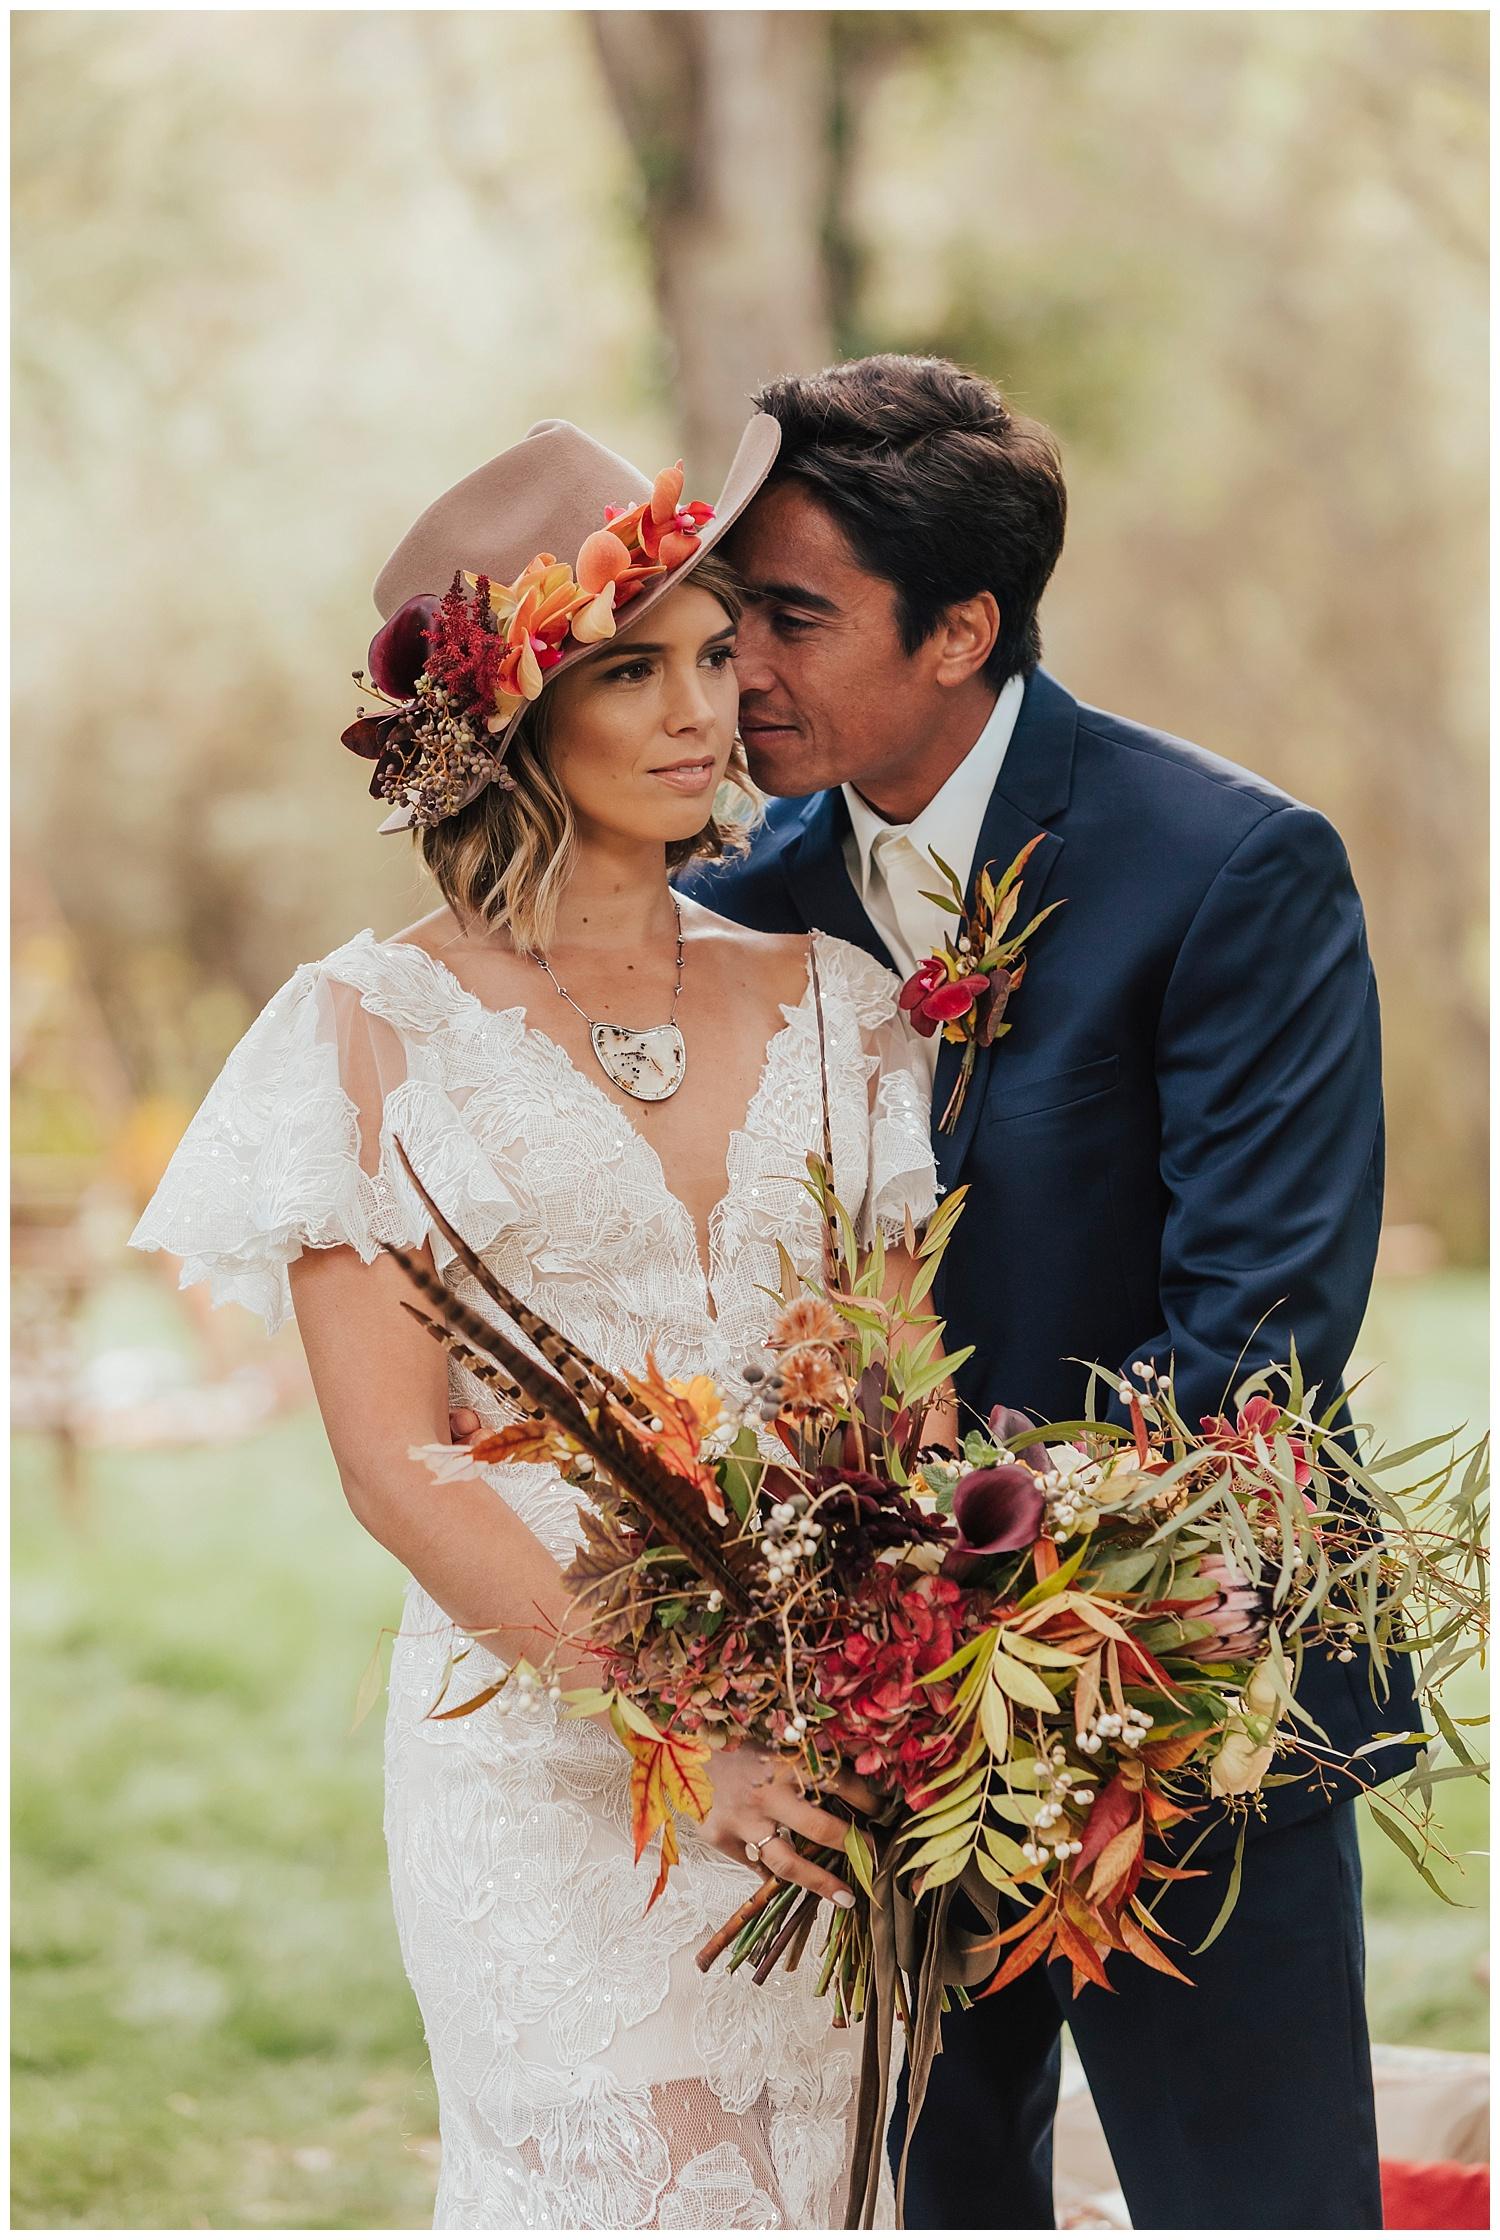 carol oliva photography groomswear navy suit